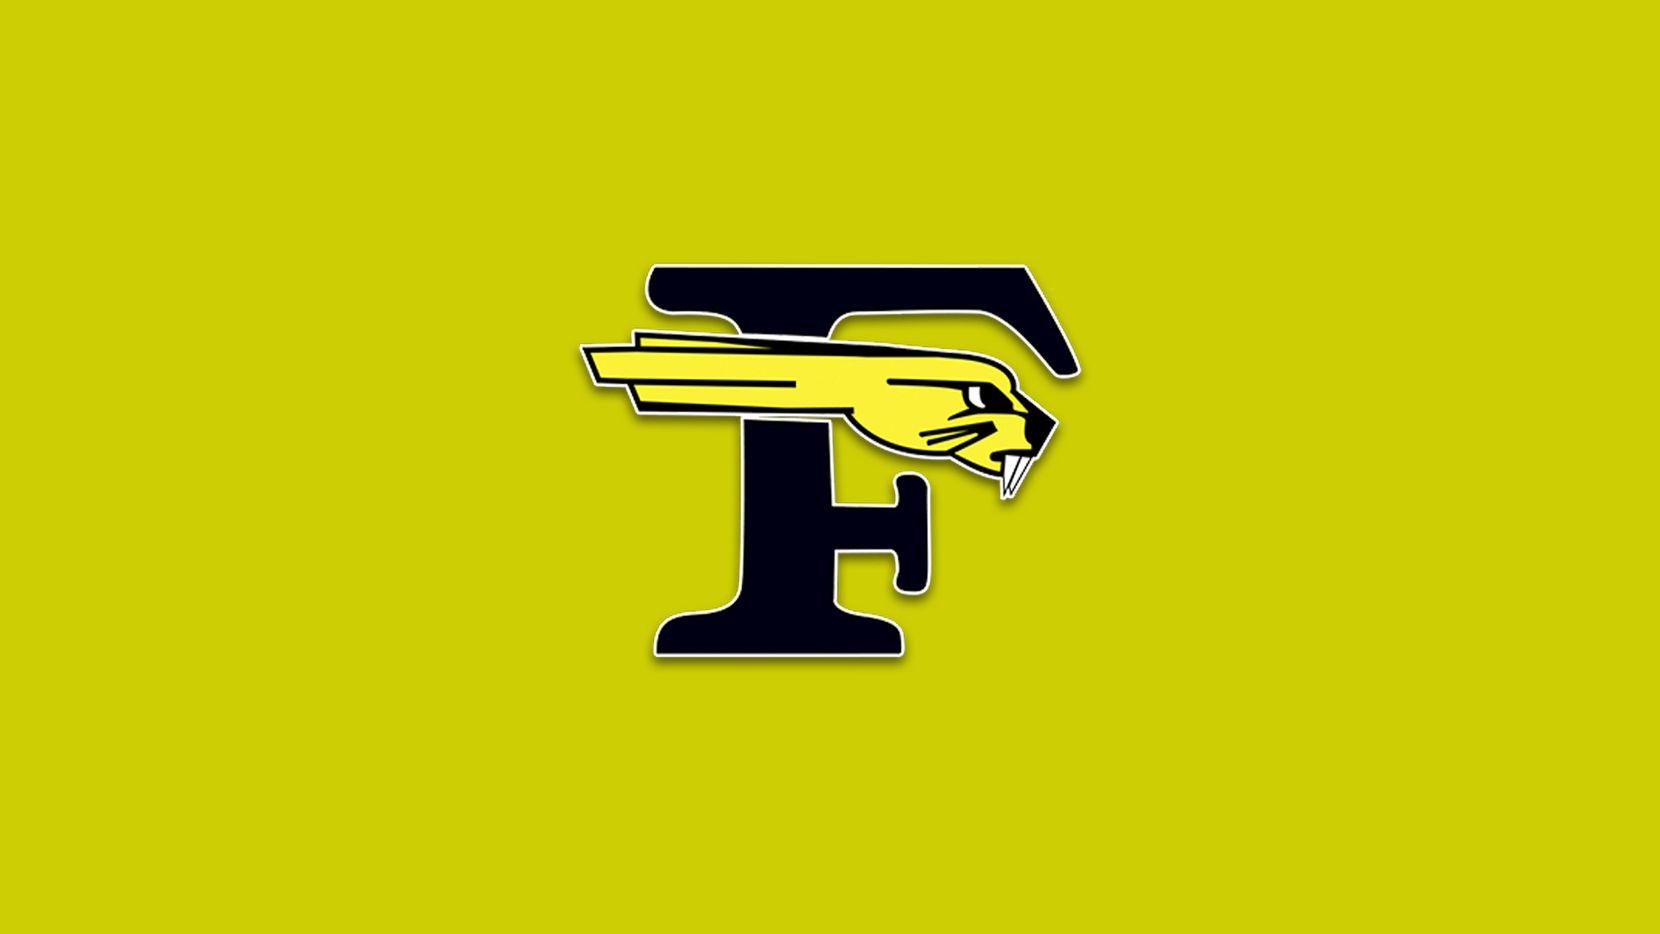 Forney logo.